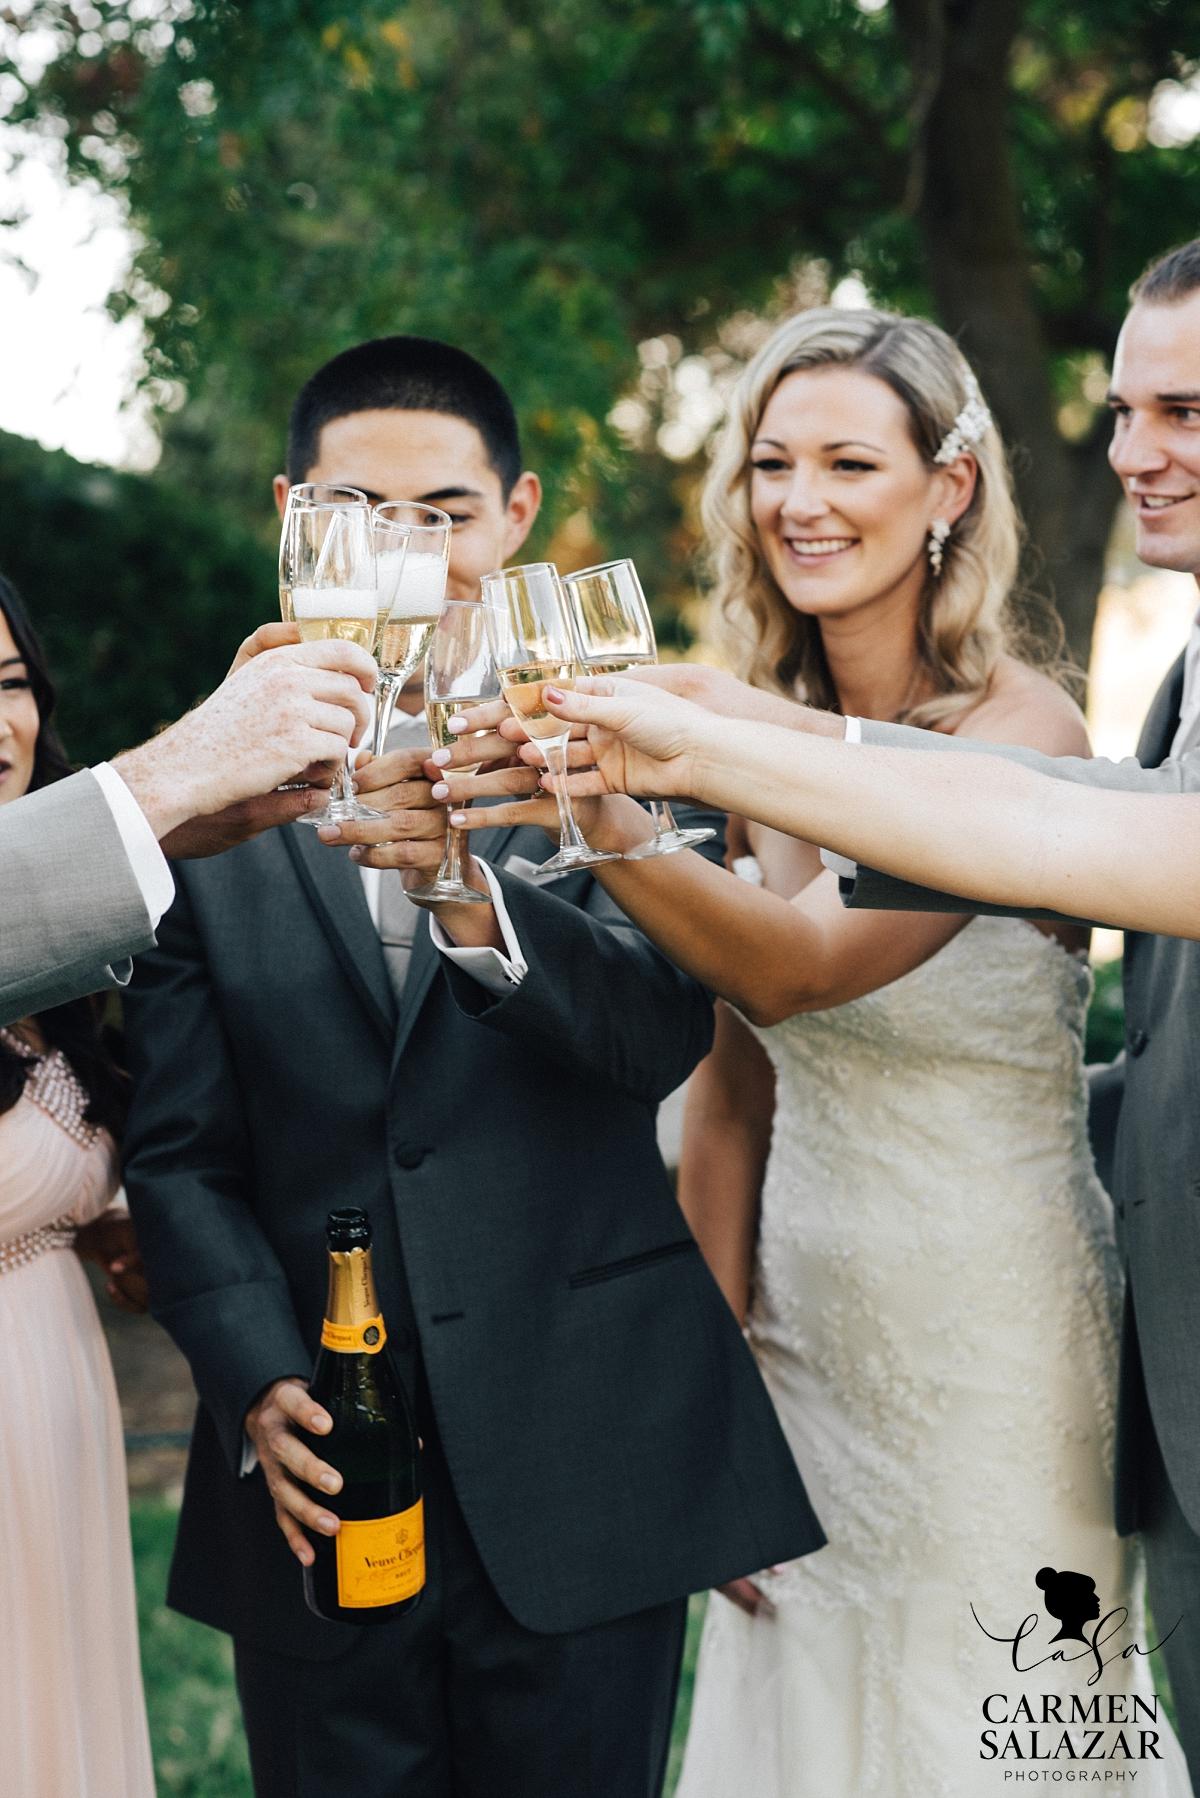 Champagne wedding toast before the ceremony - Carmen Salazar